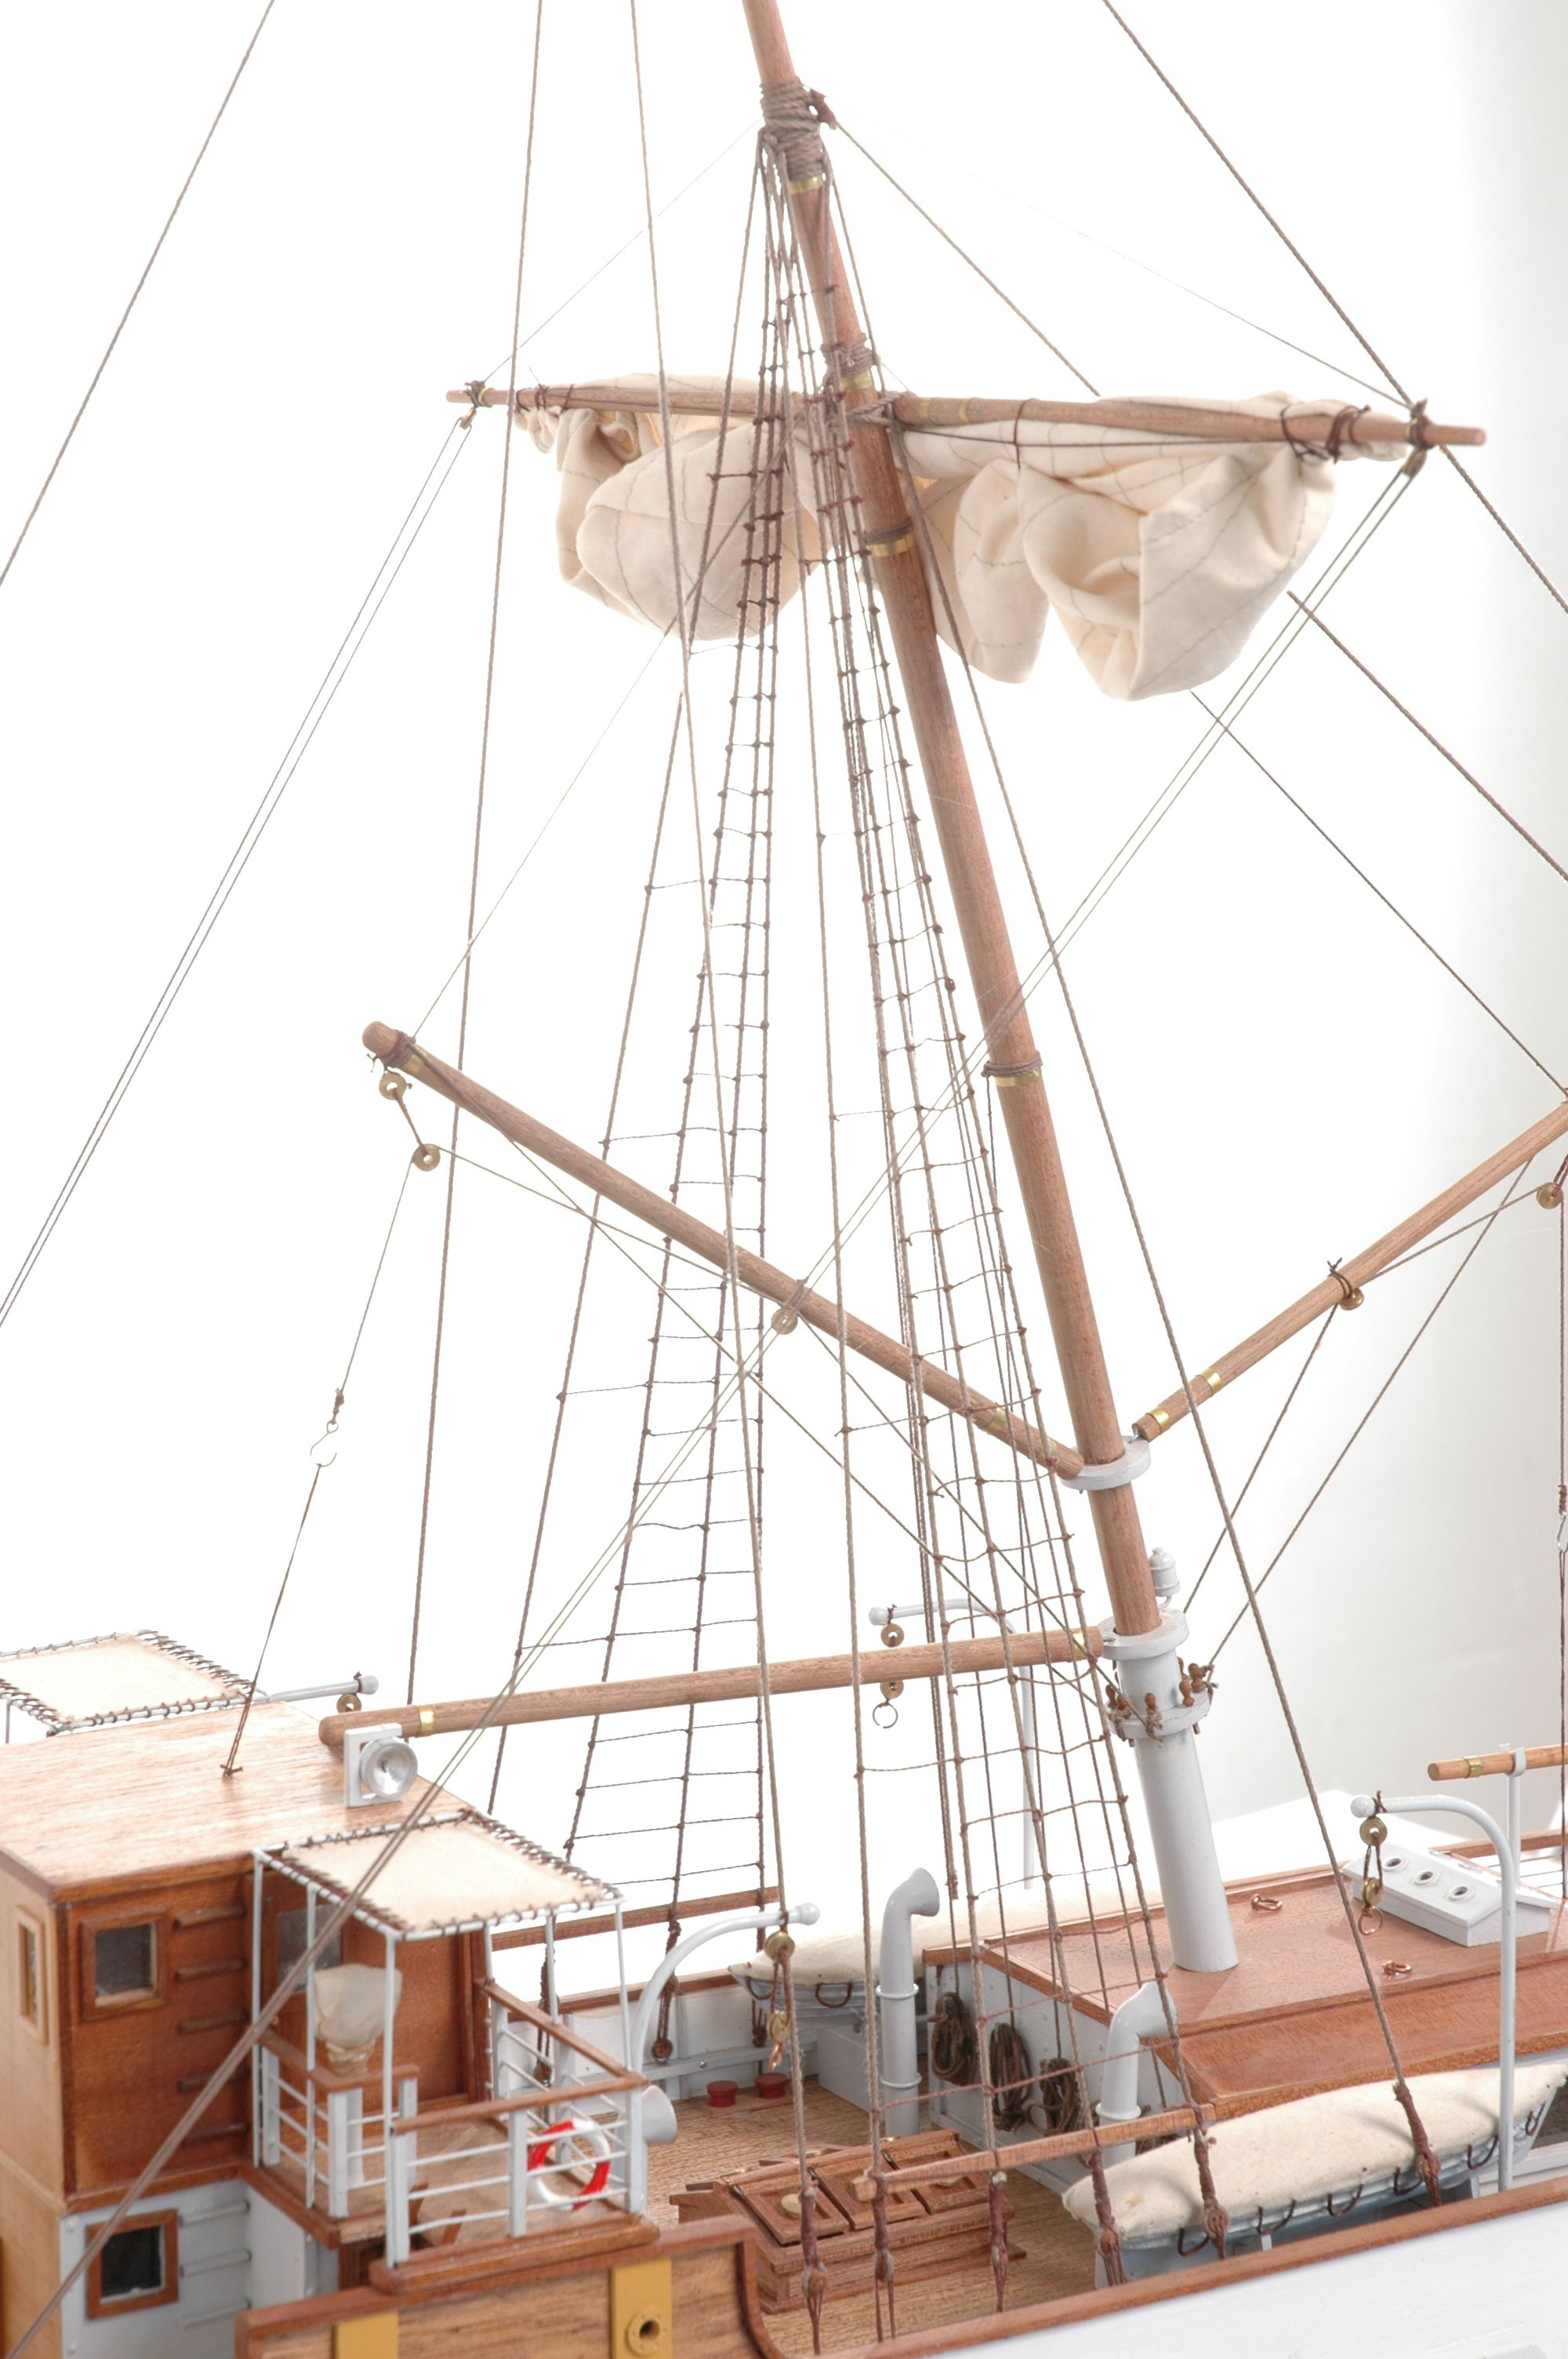 1416-6315-G-G-Loudon-Ship-Model-large-Premier-Range